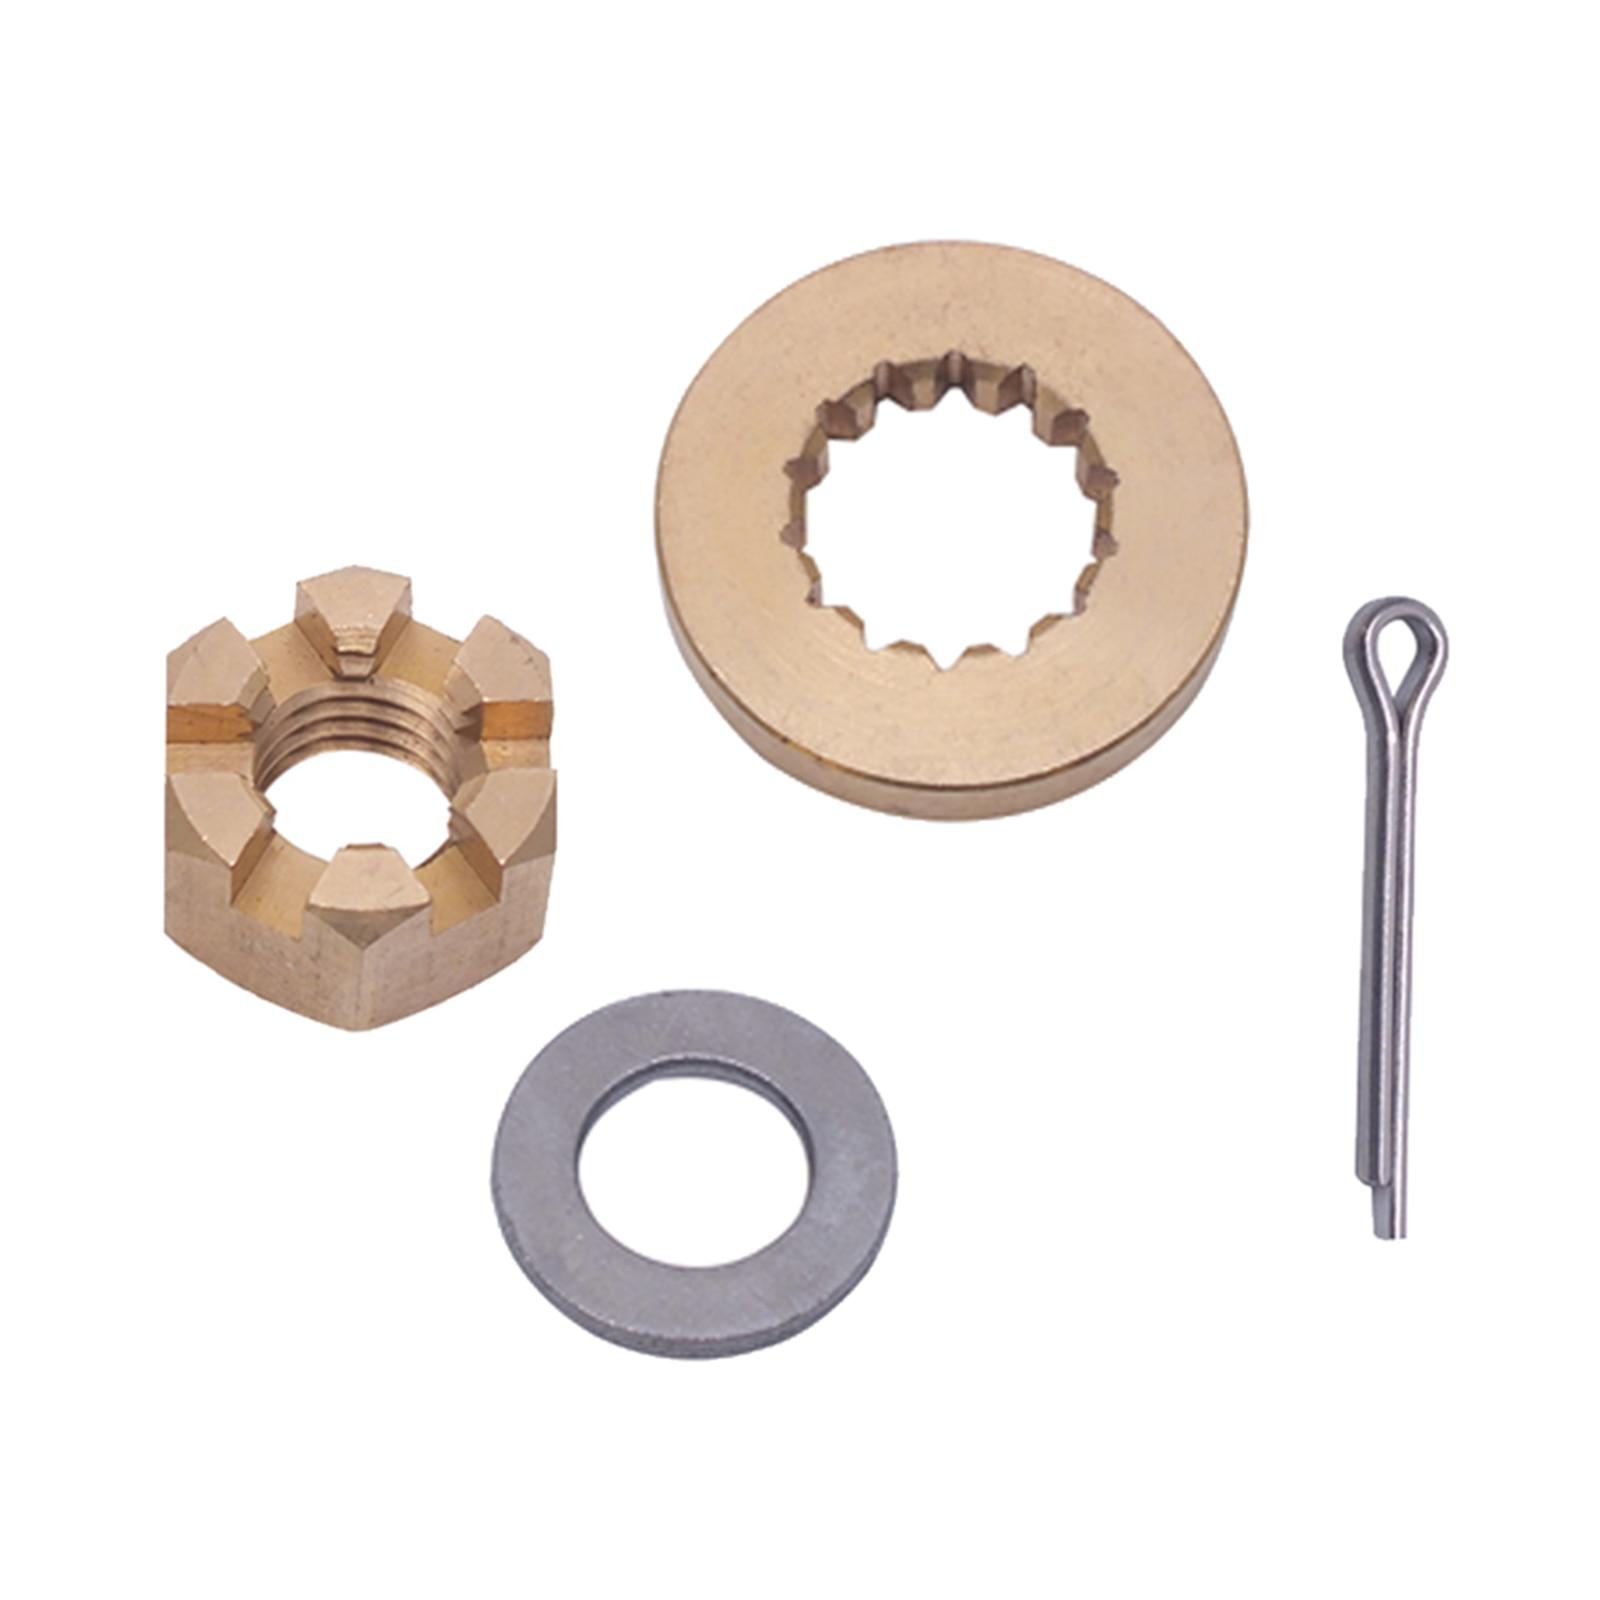 Propeller Hardware Kits Thrust Washer Spacer Nut ForBRP/JOHNSON/EVINRUDE/OMC 2 Stroke 15-35HP Propeller Installation